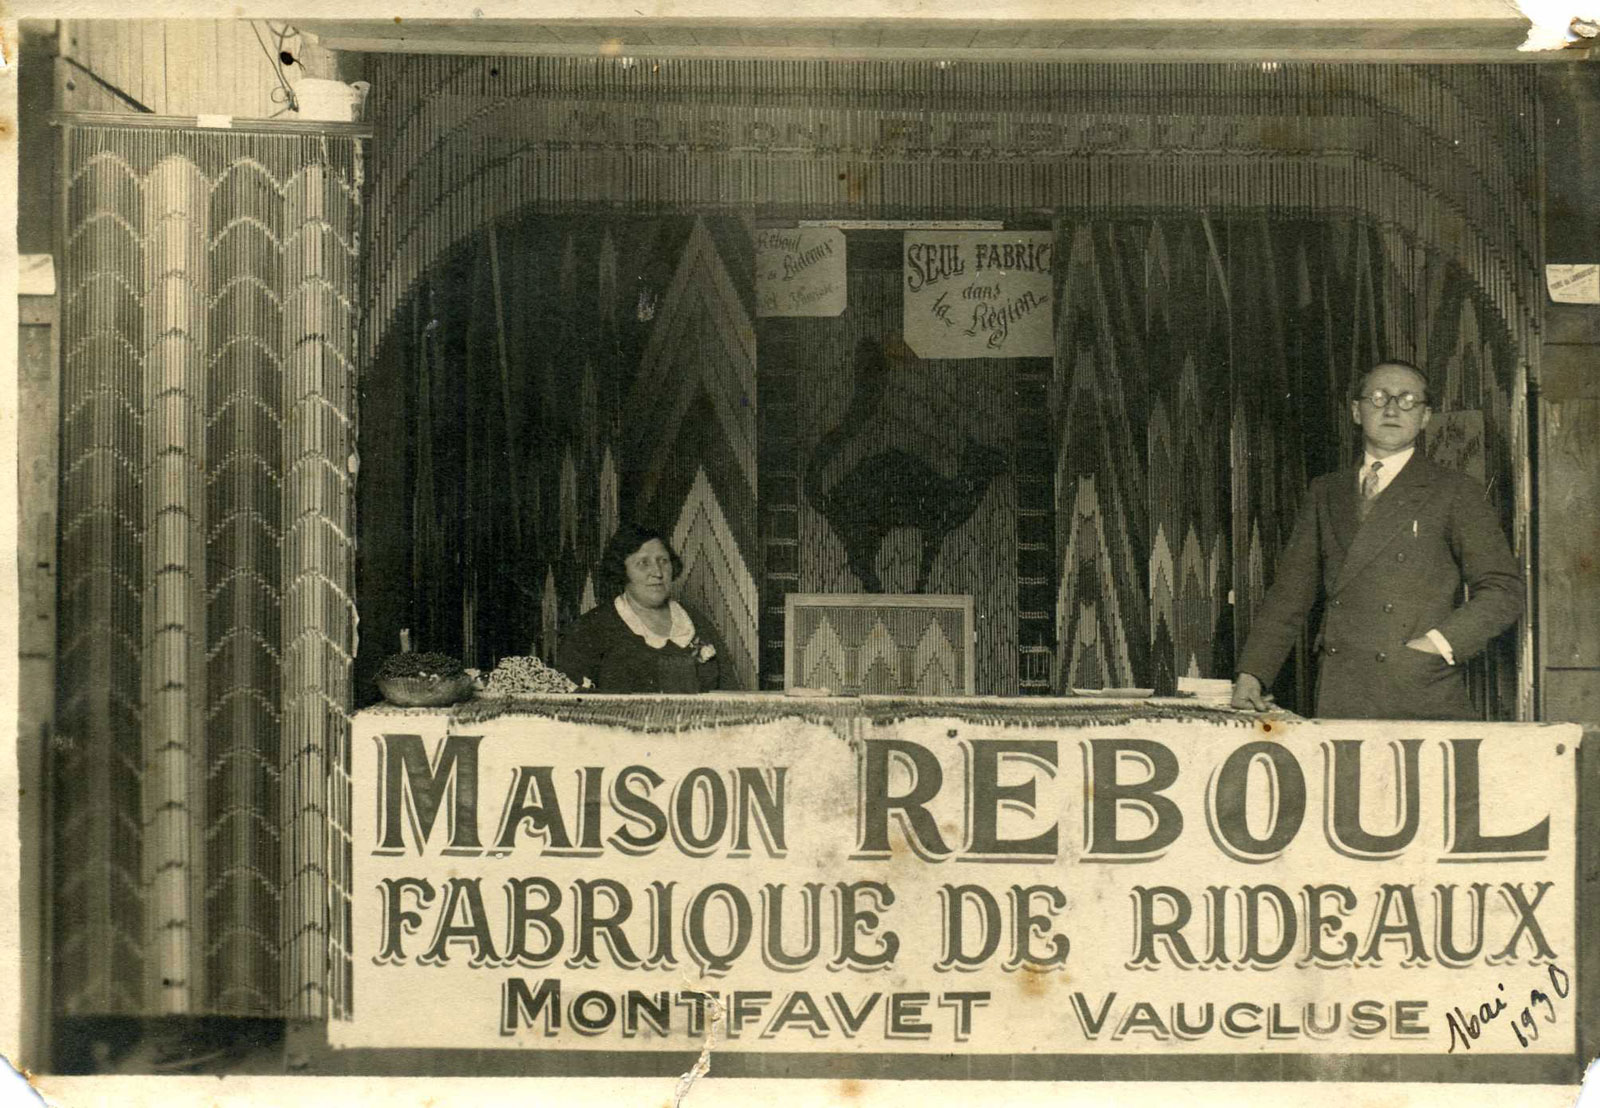 Maison-Reboul.jpg